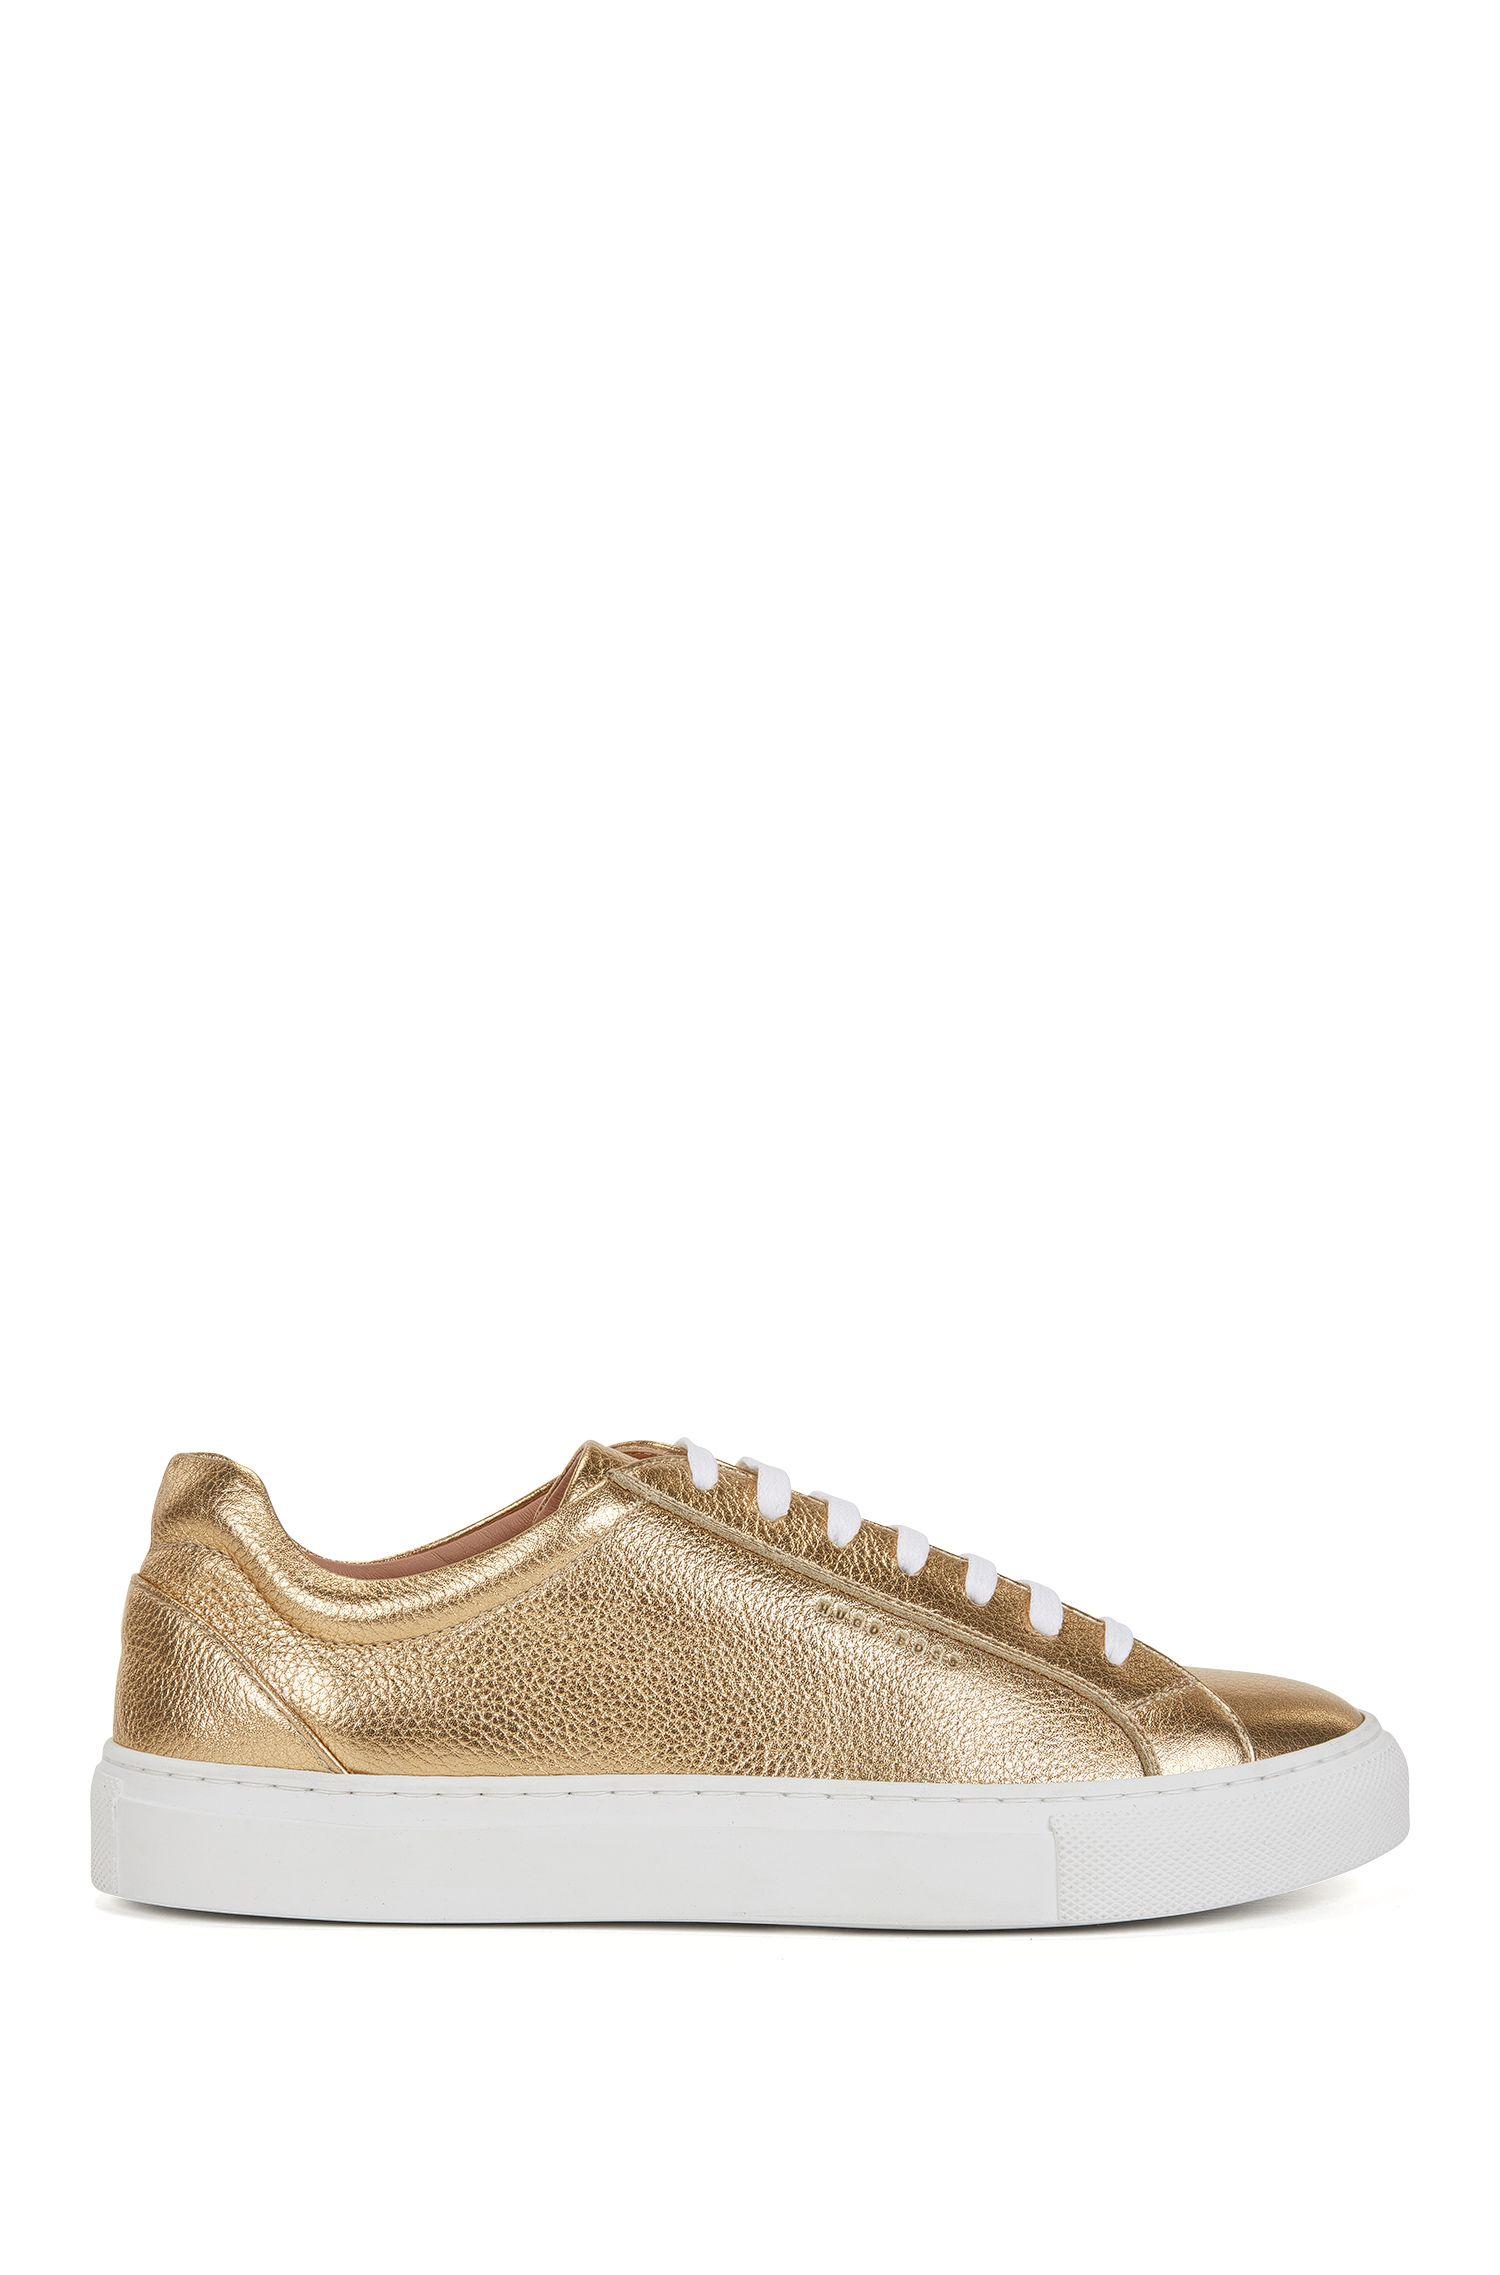 Leder-Sneakers mit Metallic-Optik